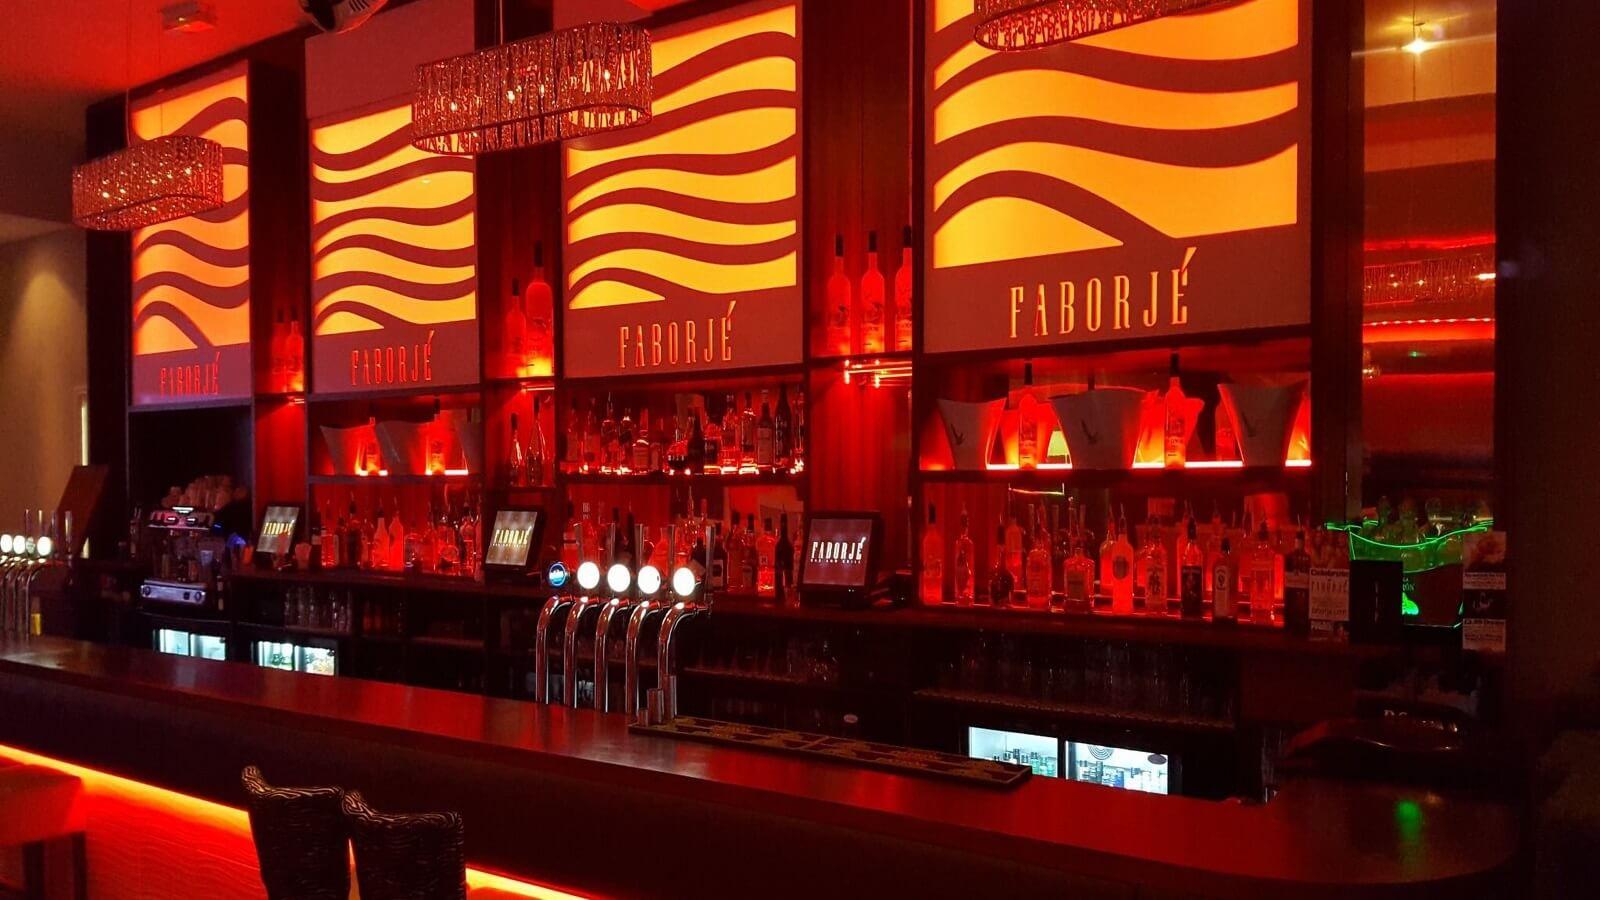 Faborje Bar & Restaurant